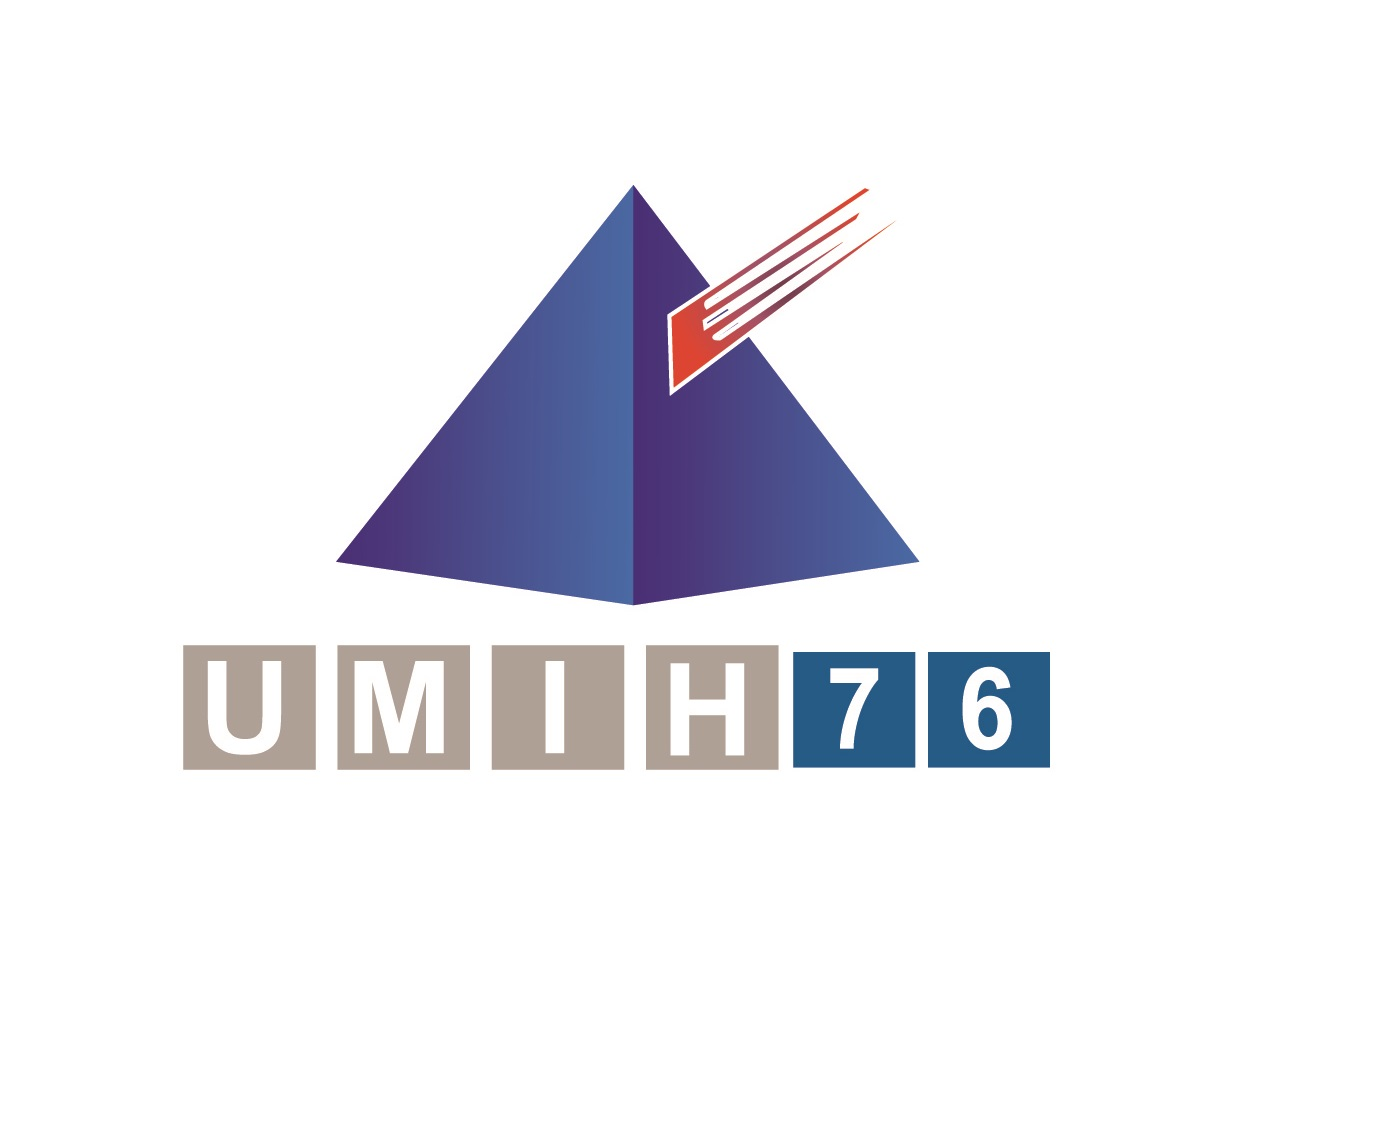 Logo umih 76 - lettres bleues